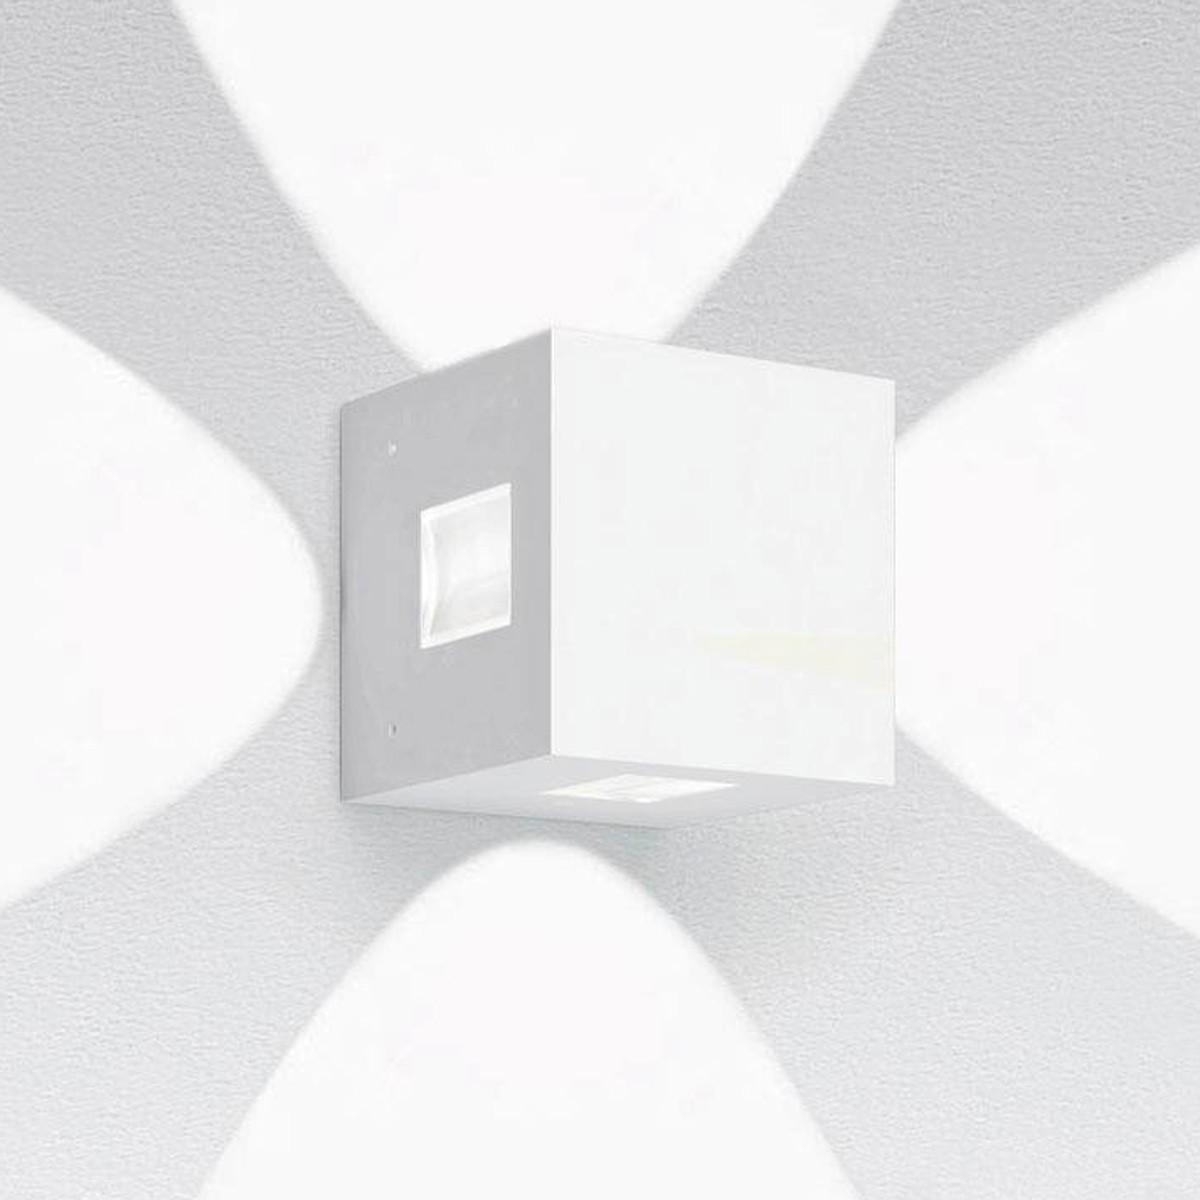 Artemide Outdoor Effetto 14S LED 4L Wandleuchte, 4 x 50°, 3000 K, hellgrau